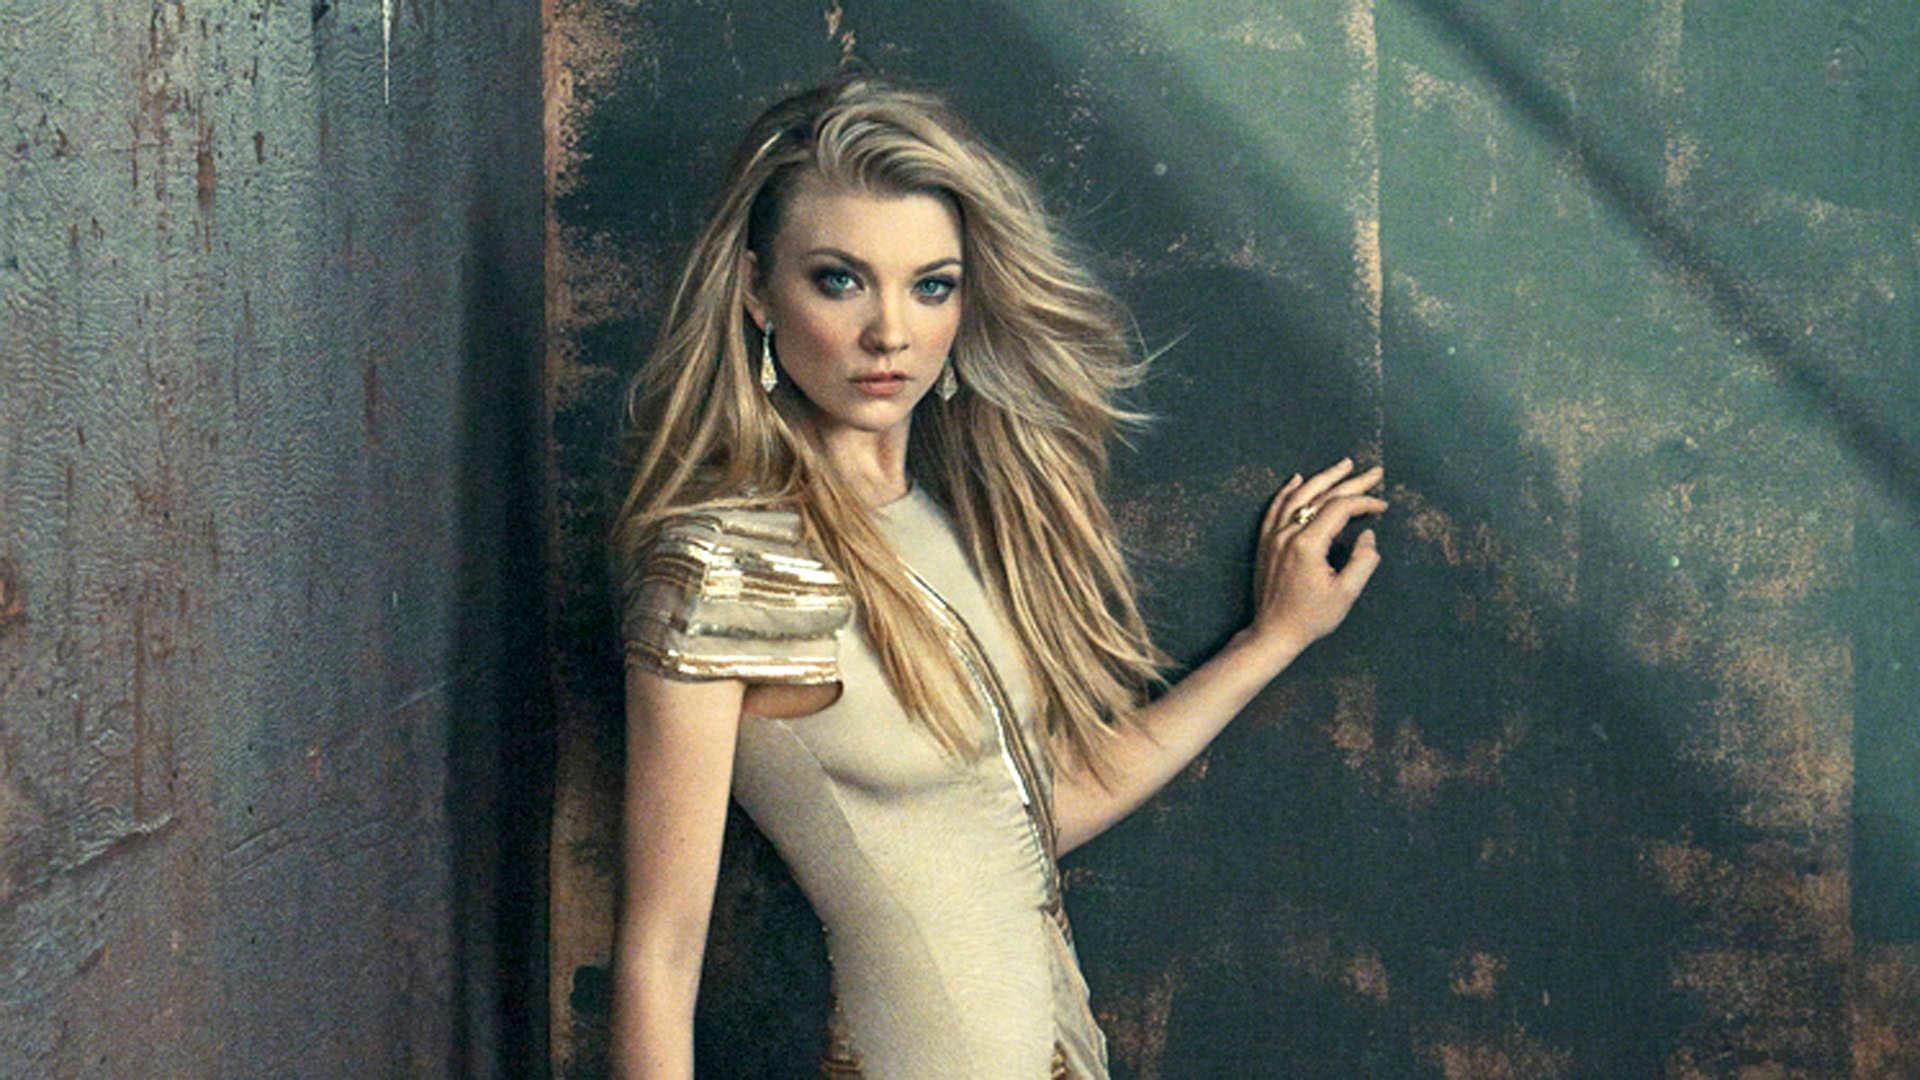 Natalie Dormer Perfect Woman Photoshoot wallpaper